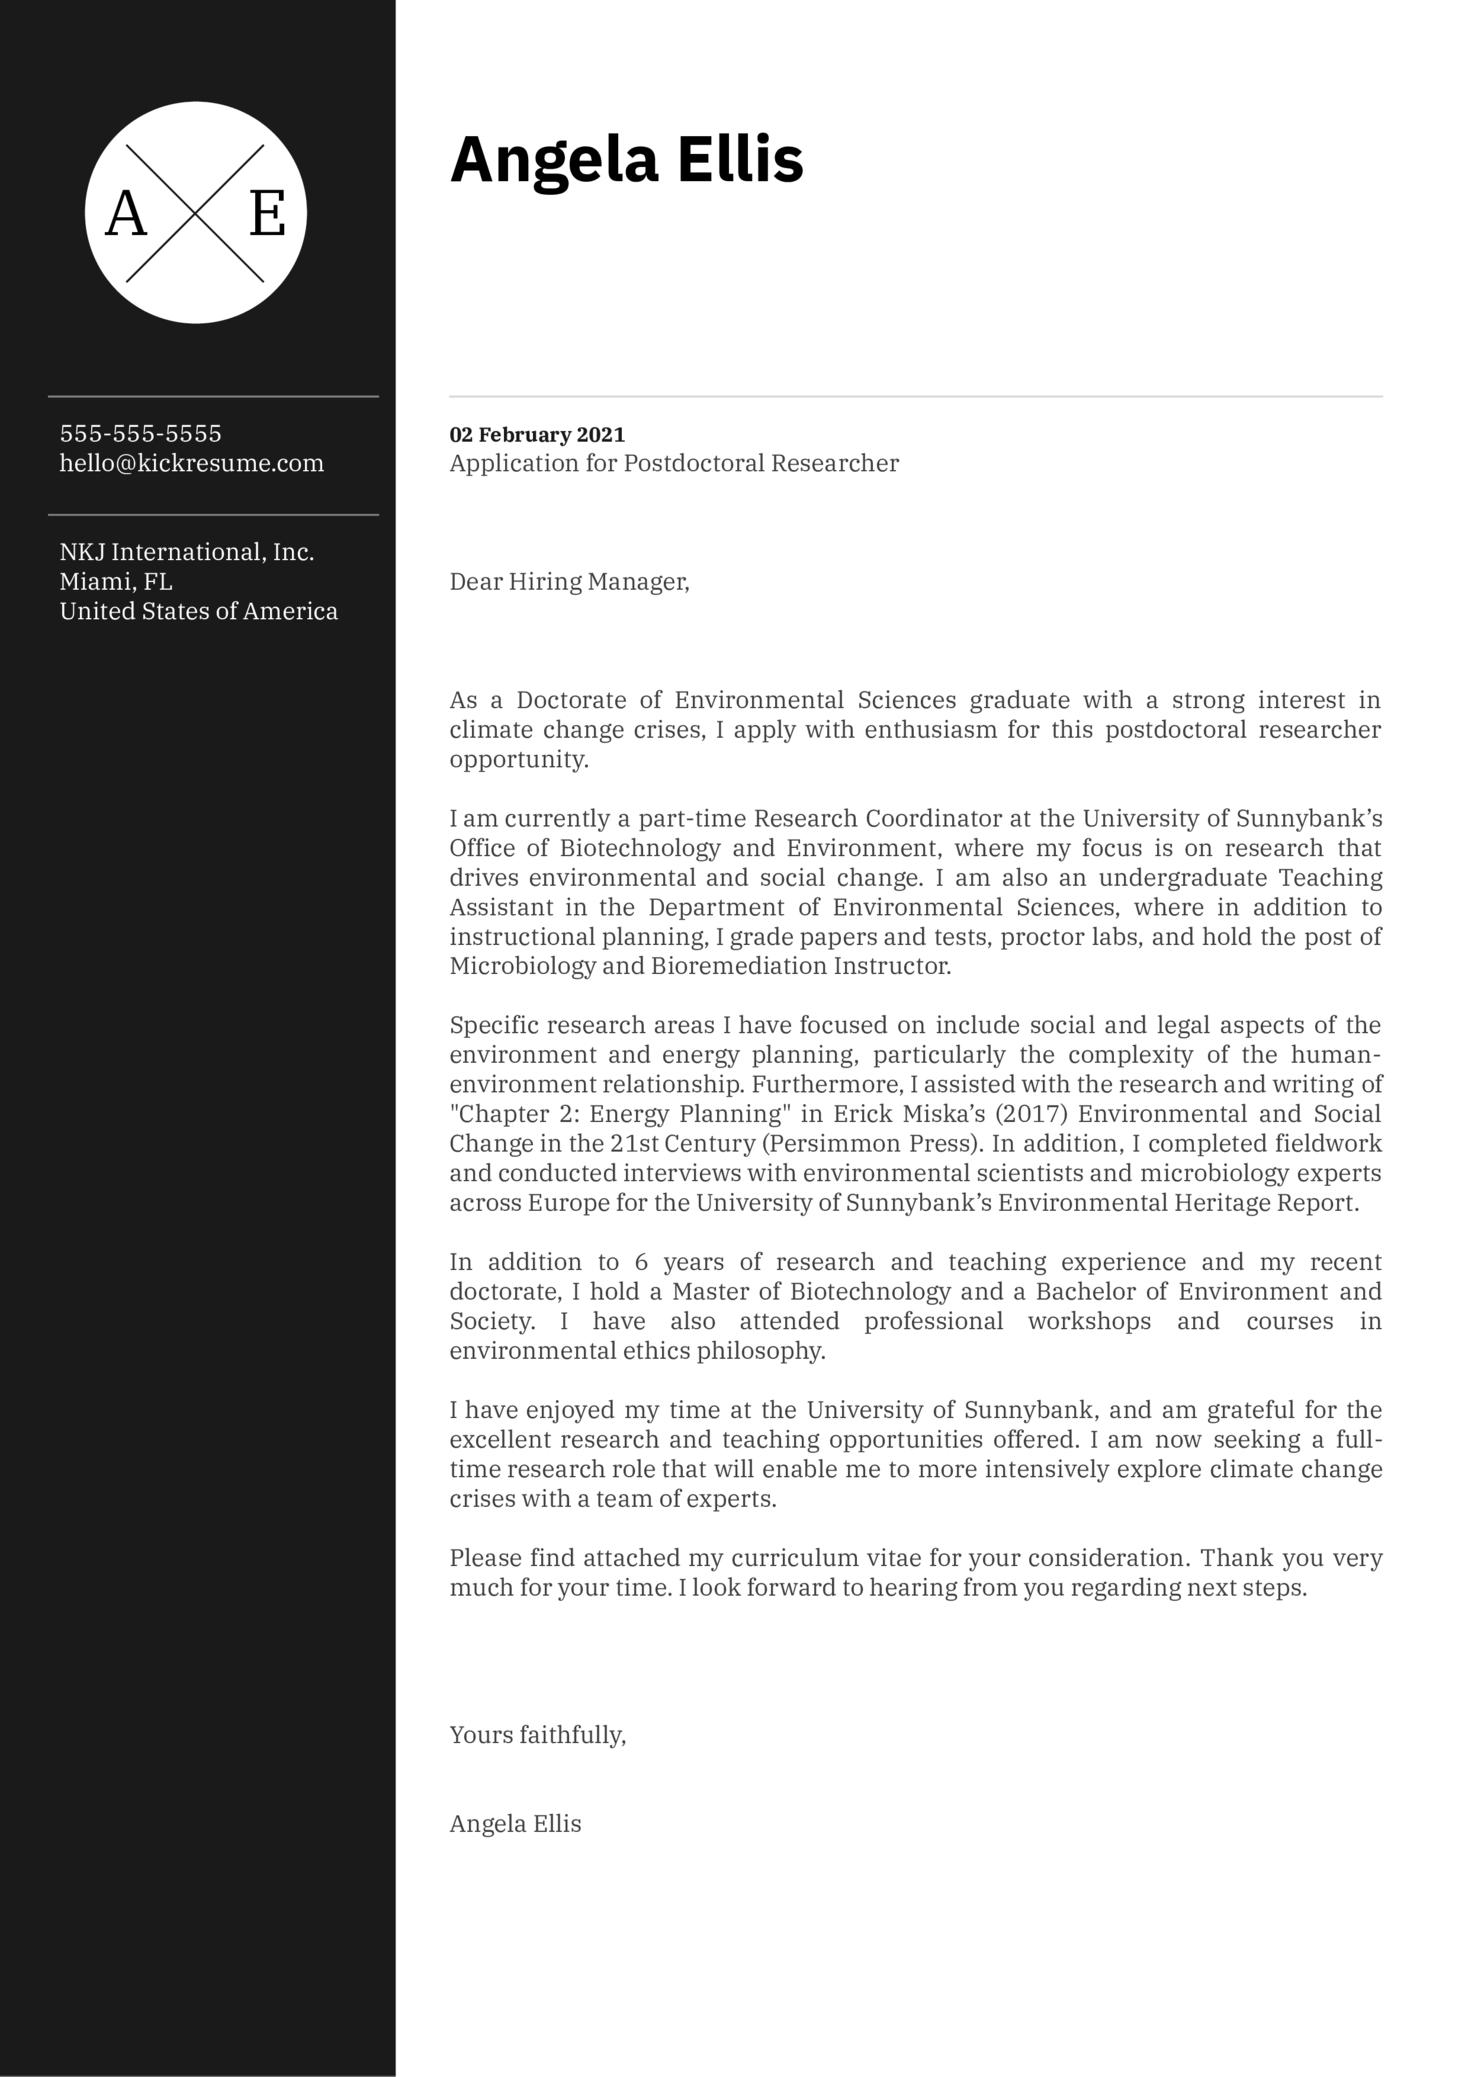 Postdoctoral Researcher Cover Letter Sample